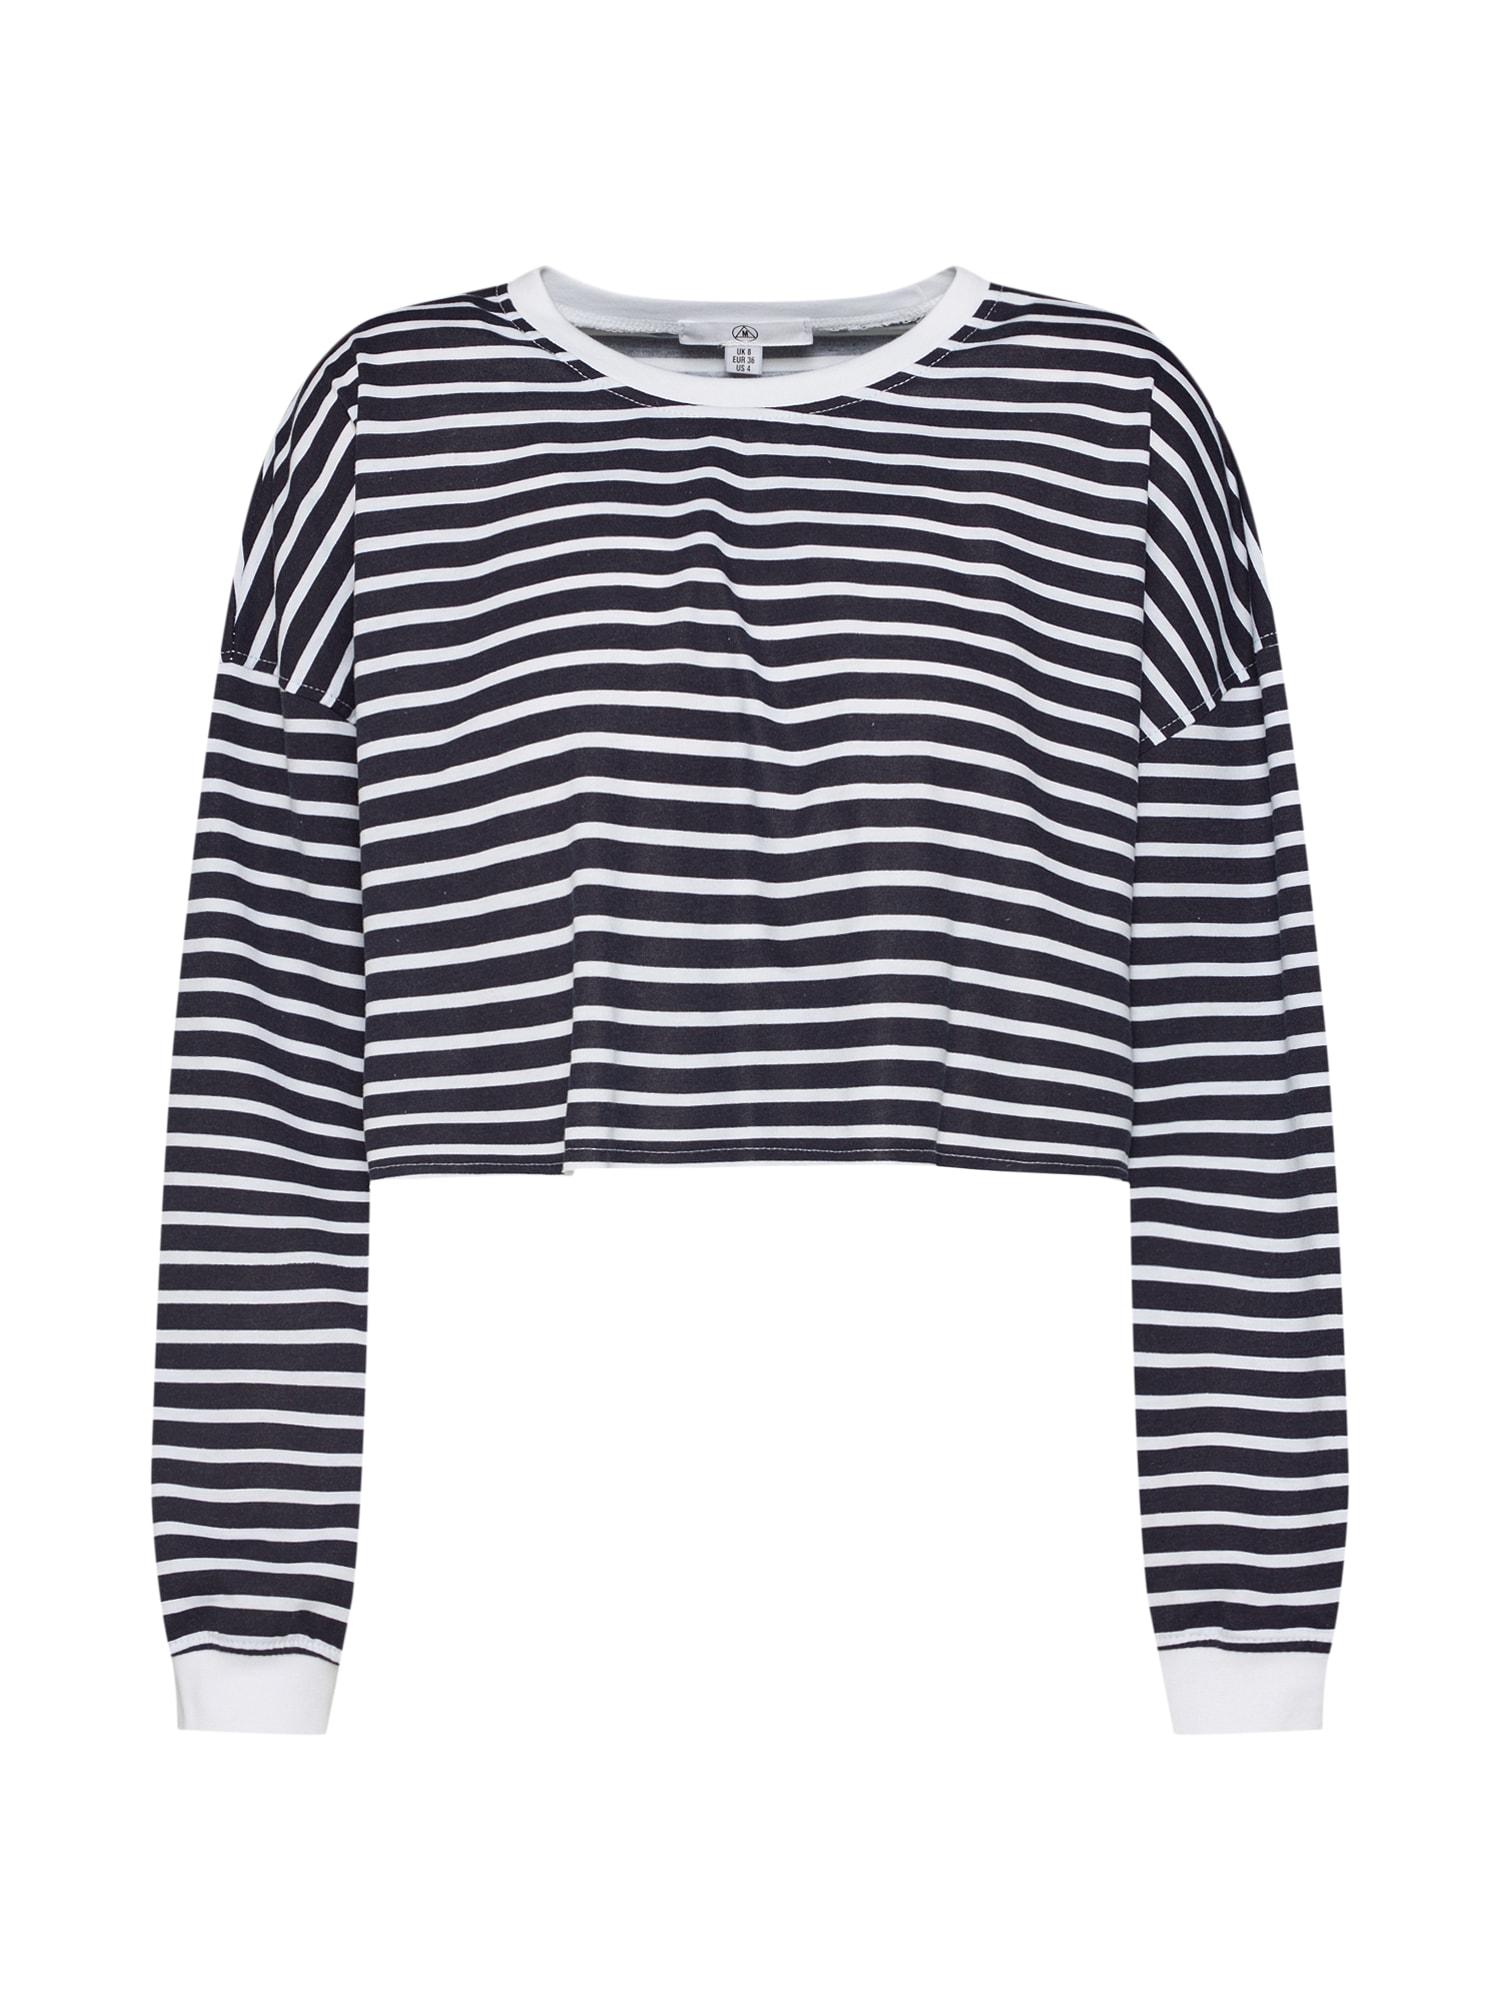 Tričko námořnická modř bílá Missguided